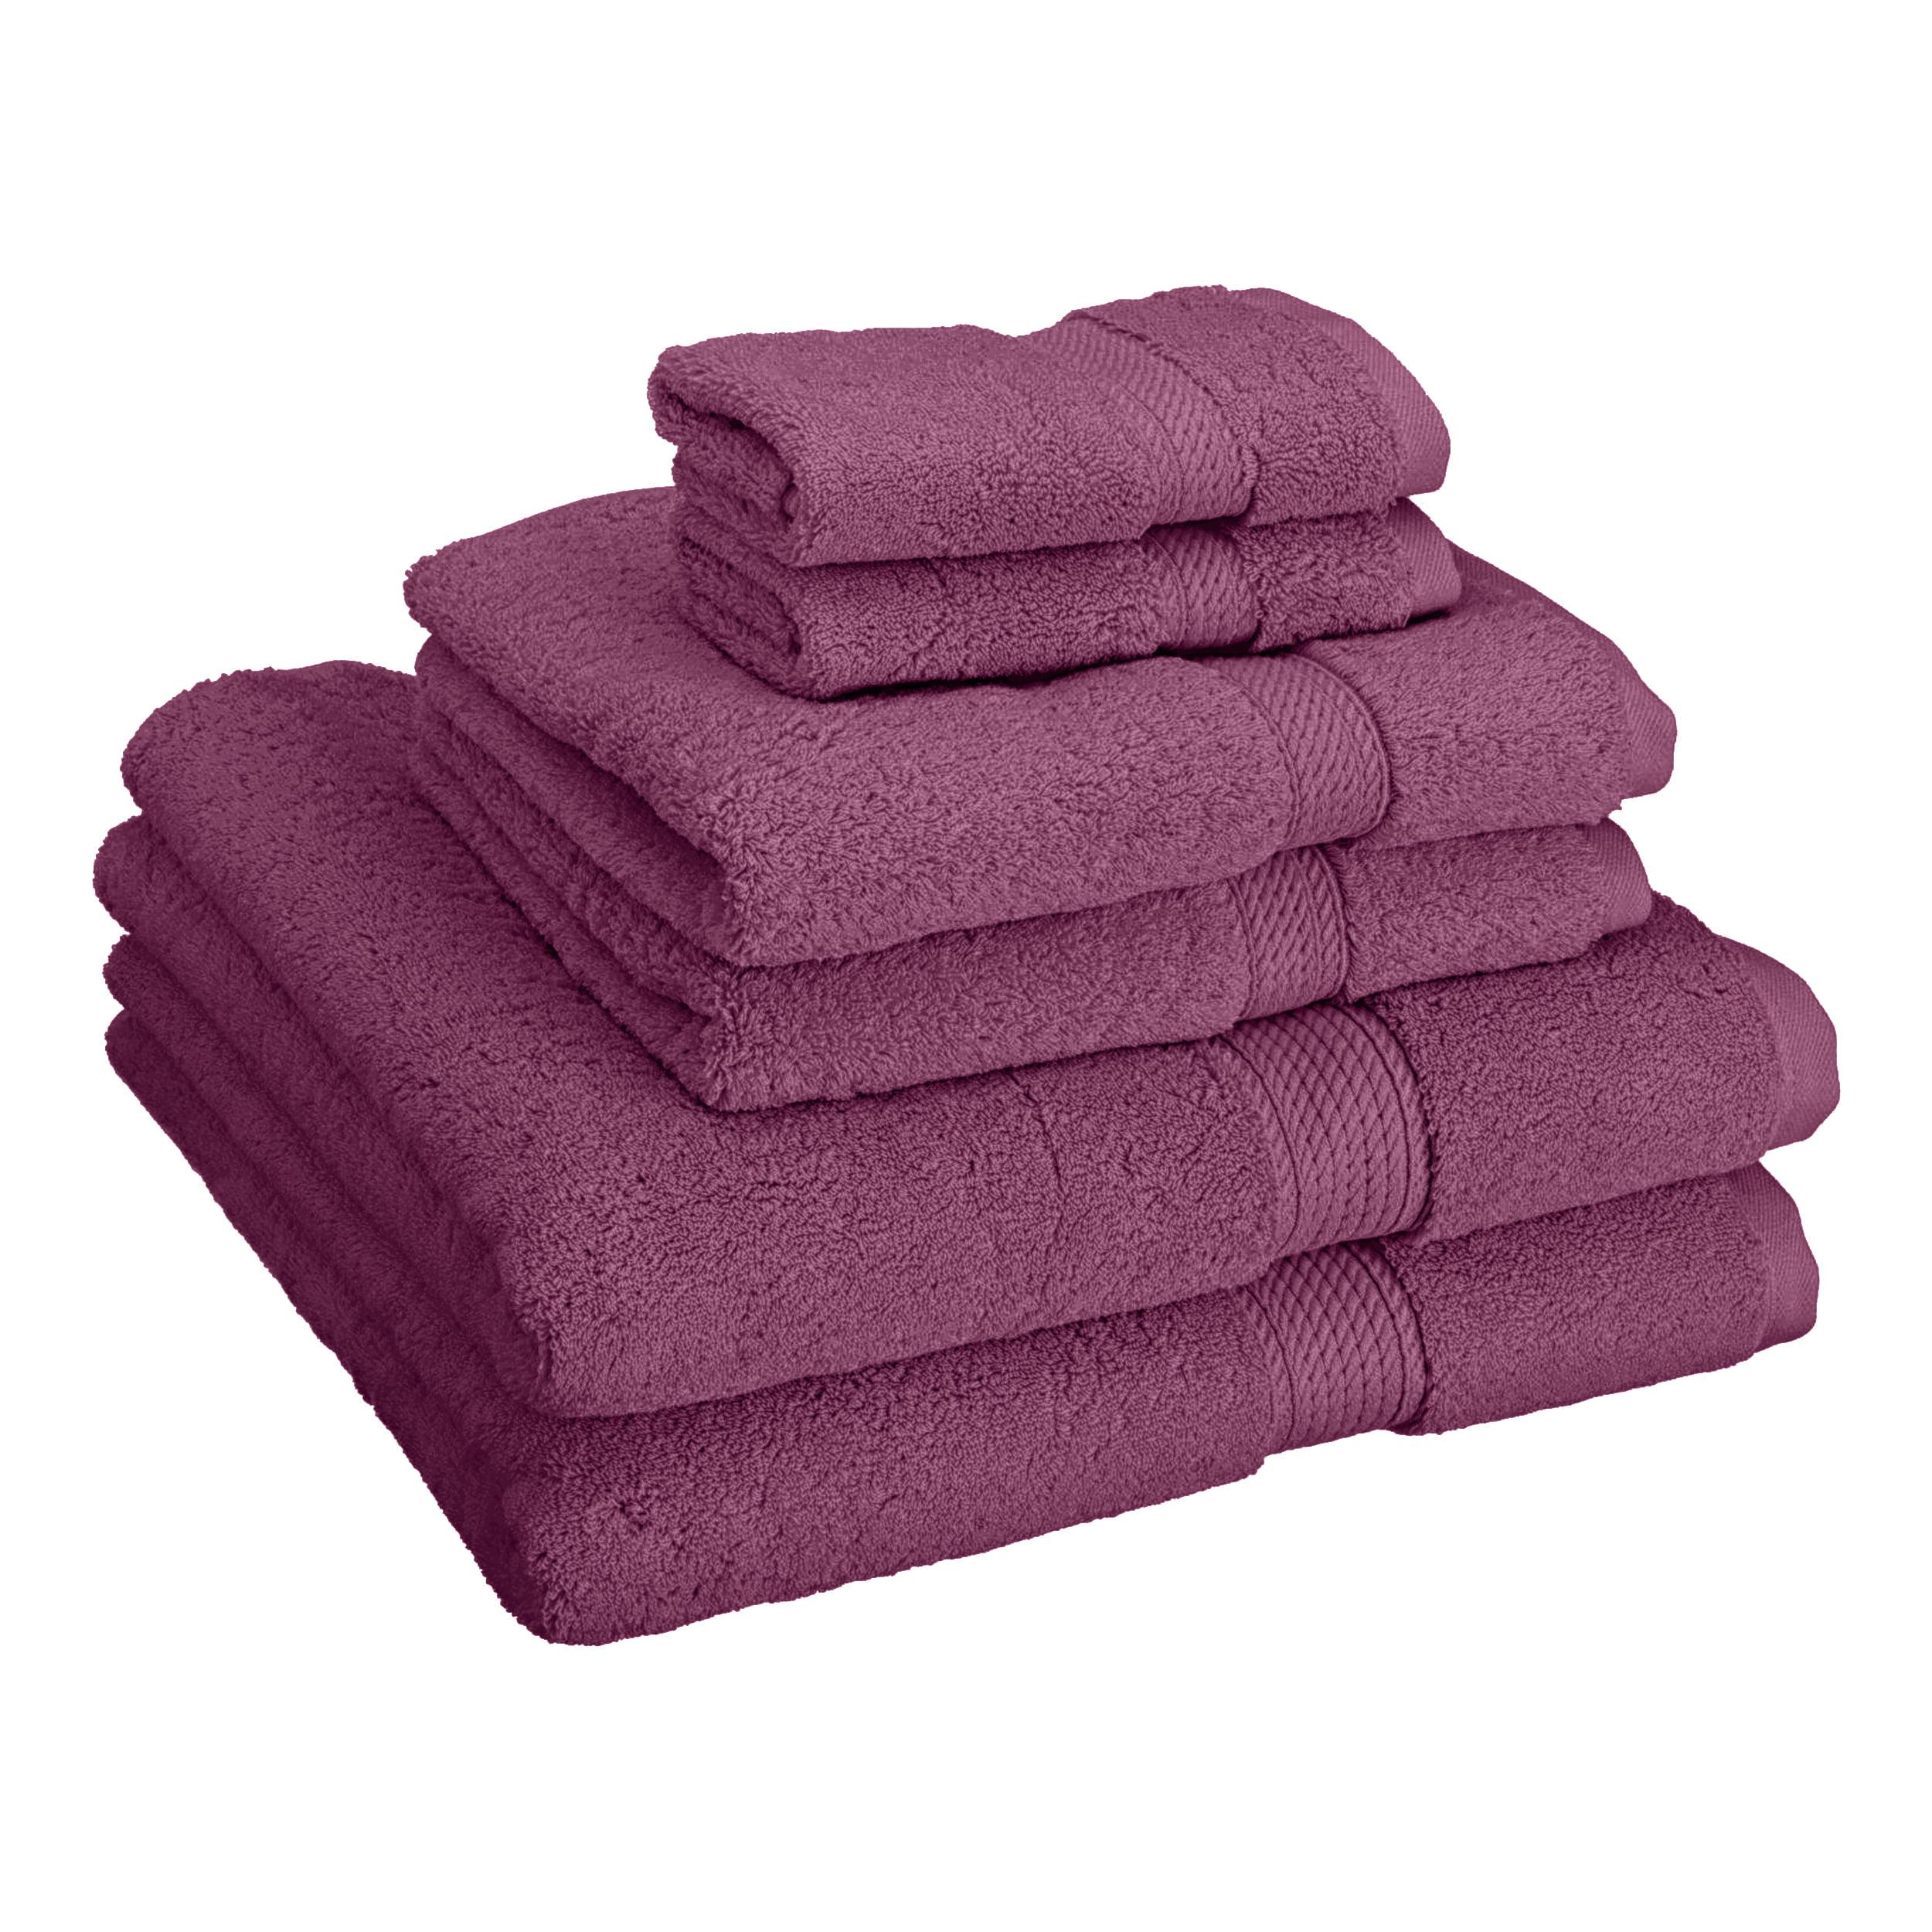 Superior 900GSM Egyptian Quality Cotton 6-Piece Towel Set